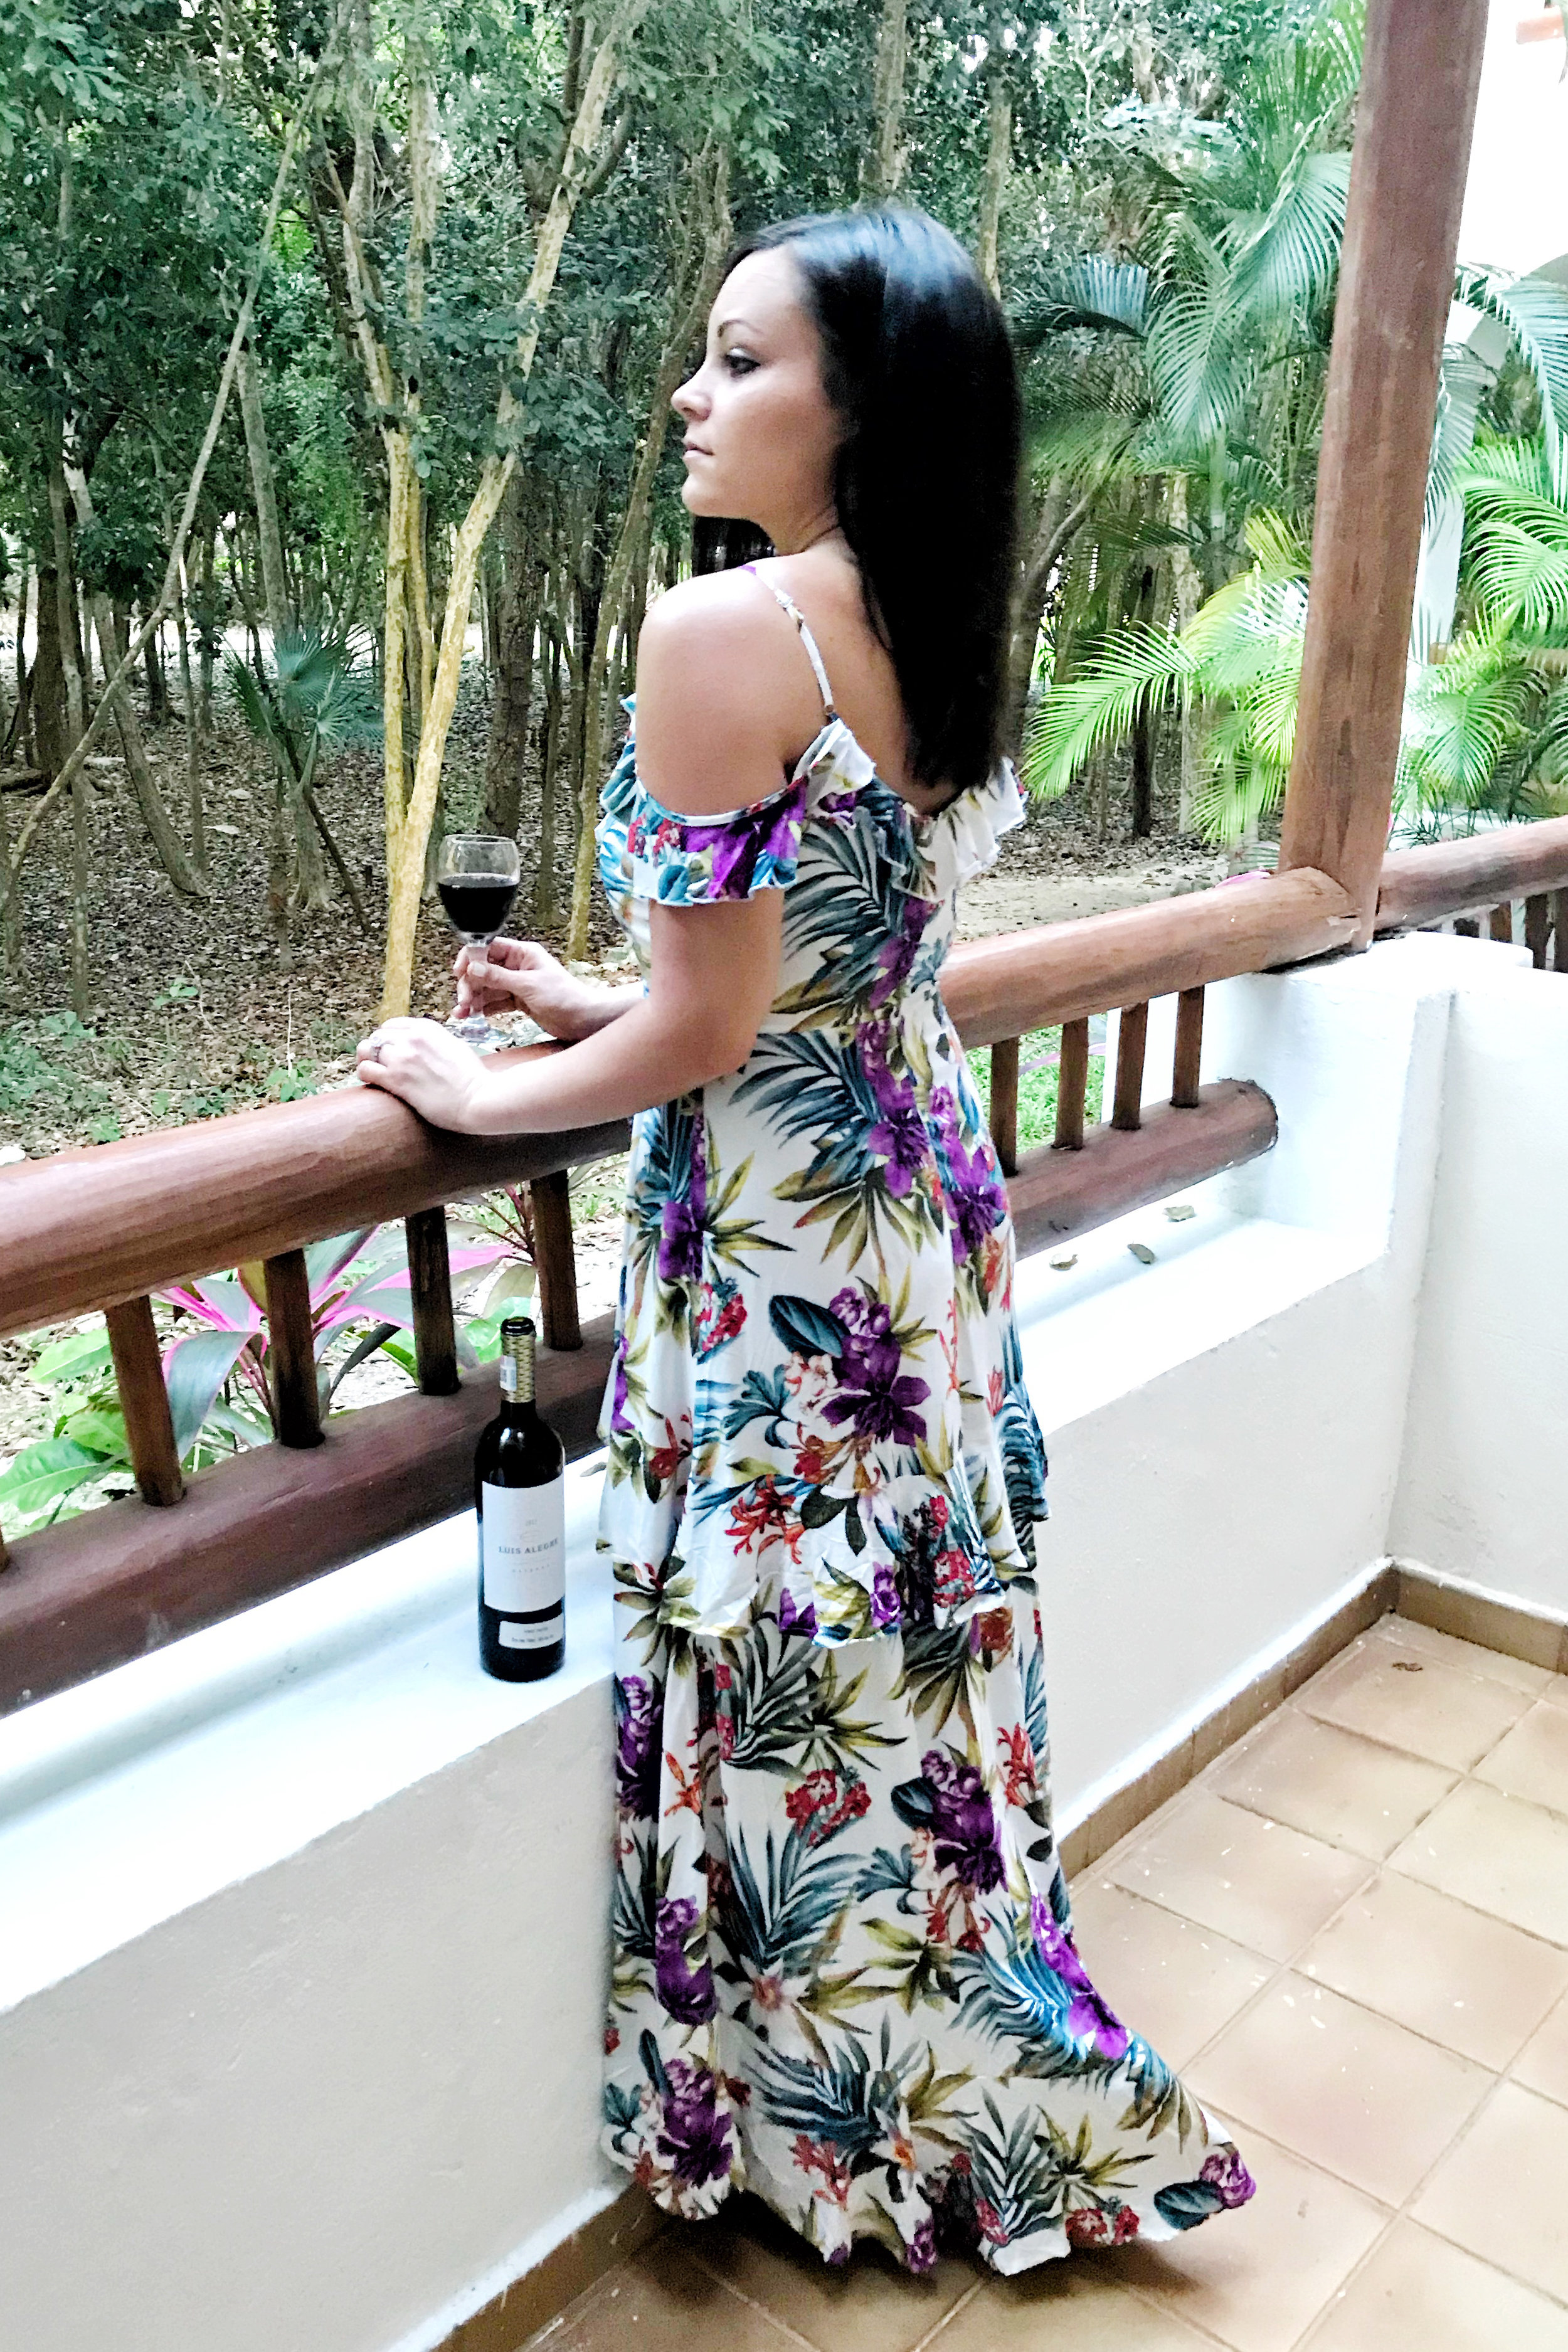 Laura Swan Sieckman - Forever 21 Floral Dress